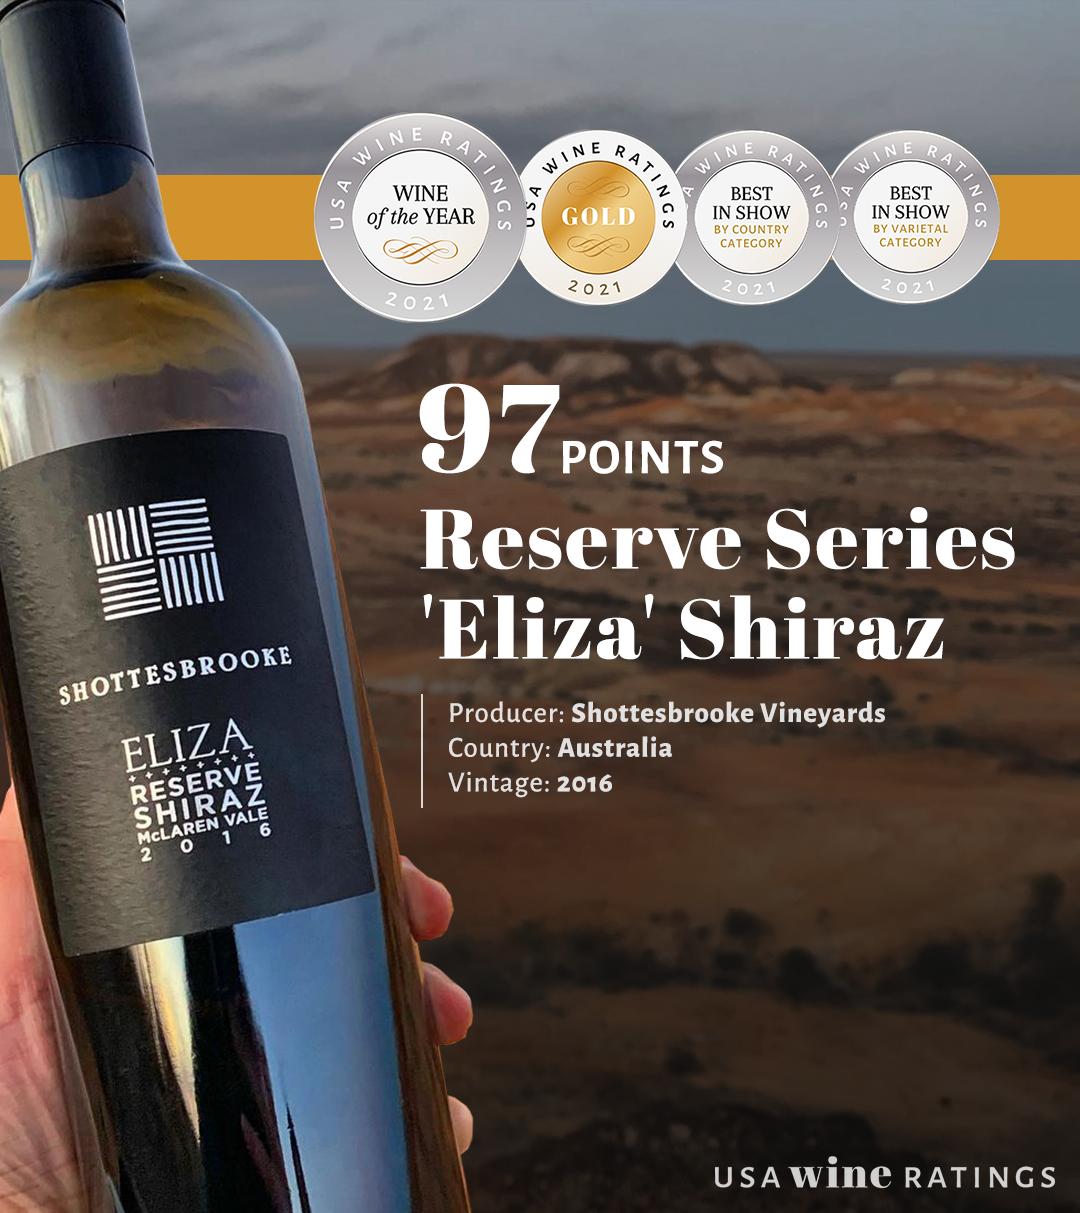 Shottesbrooke Reserve Series 'Eliza' Shiraz